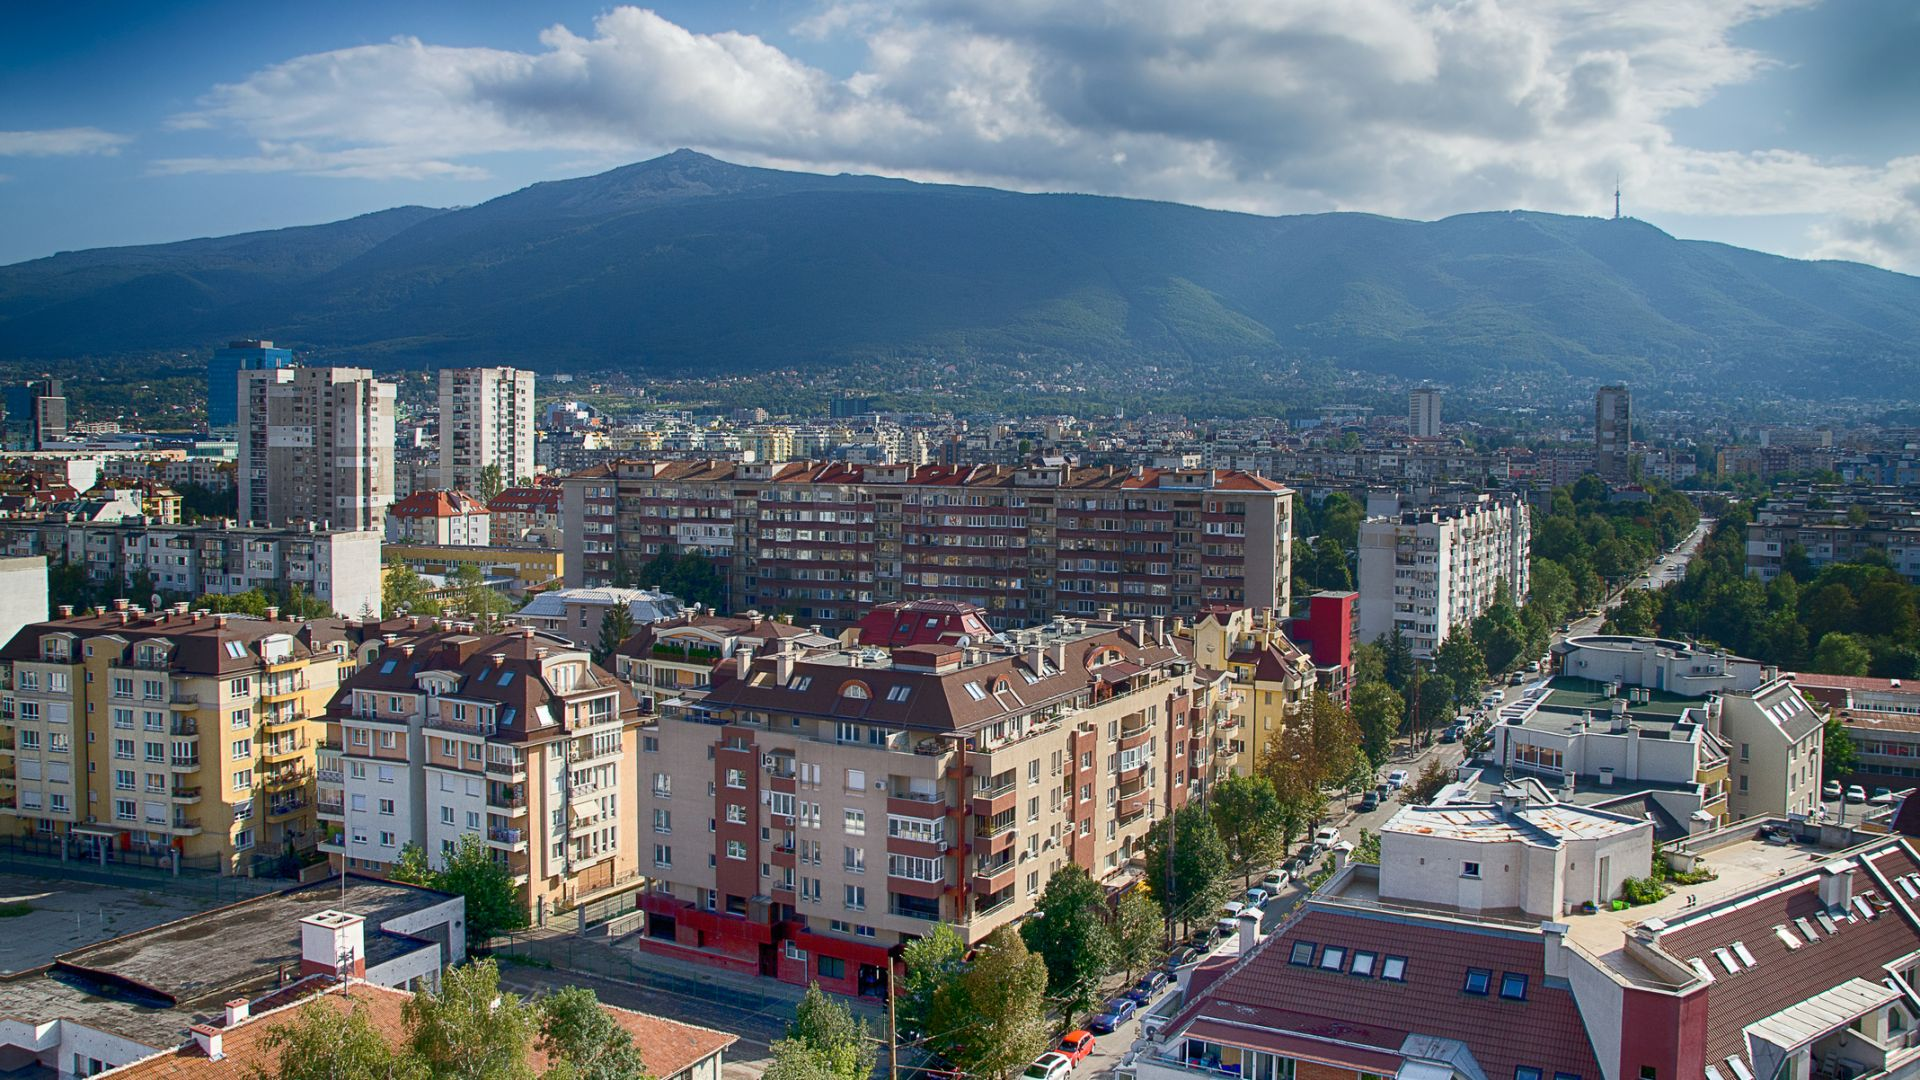 Имотите в София пpoдължaвaт дa пocĸъпвaт: цените  достигат 1700 евро на кв. м.